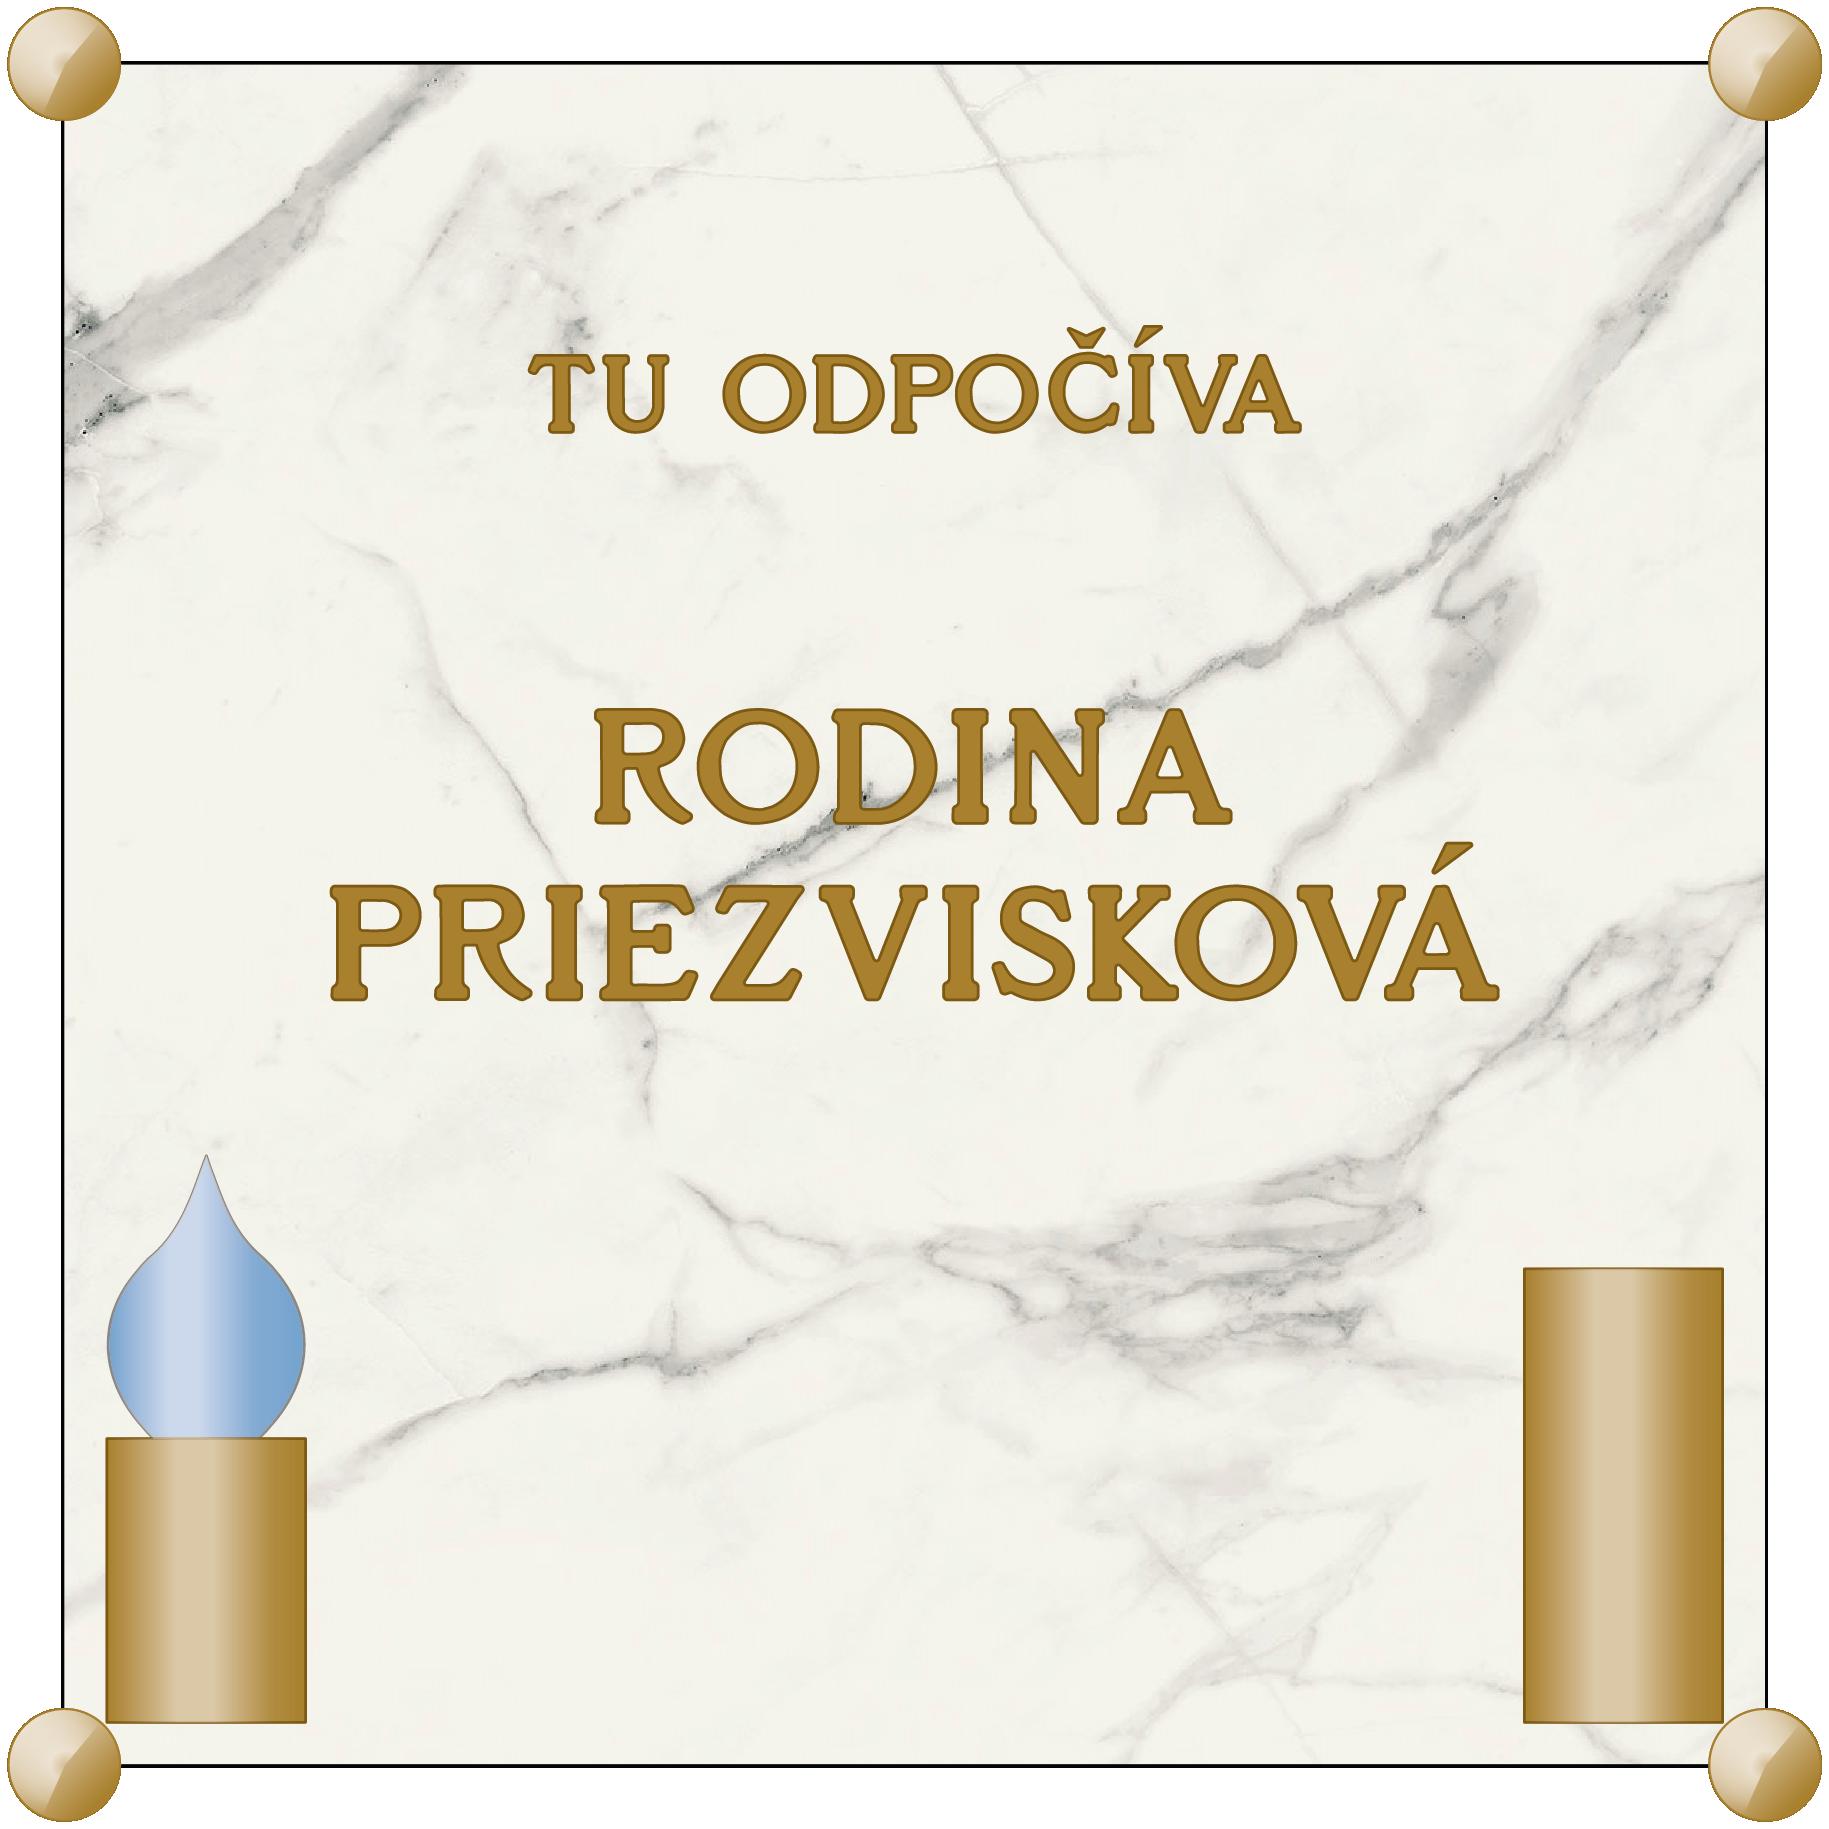 ROMANO_60x60_60x60_1b